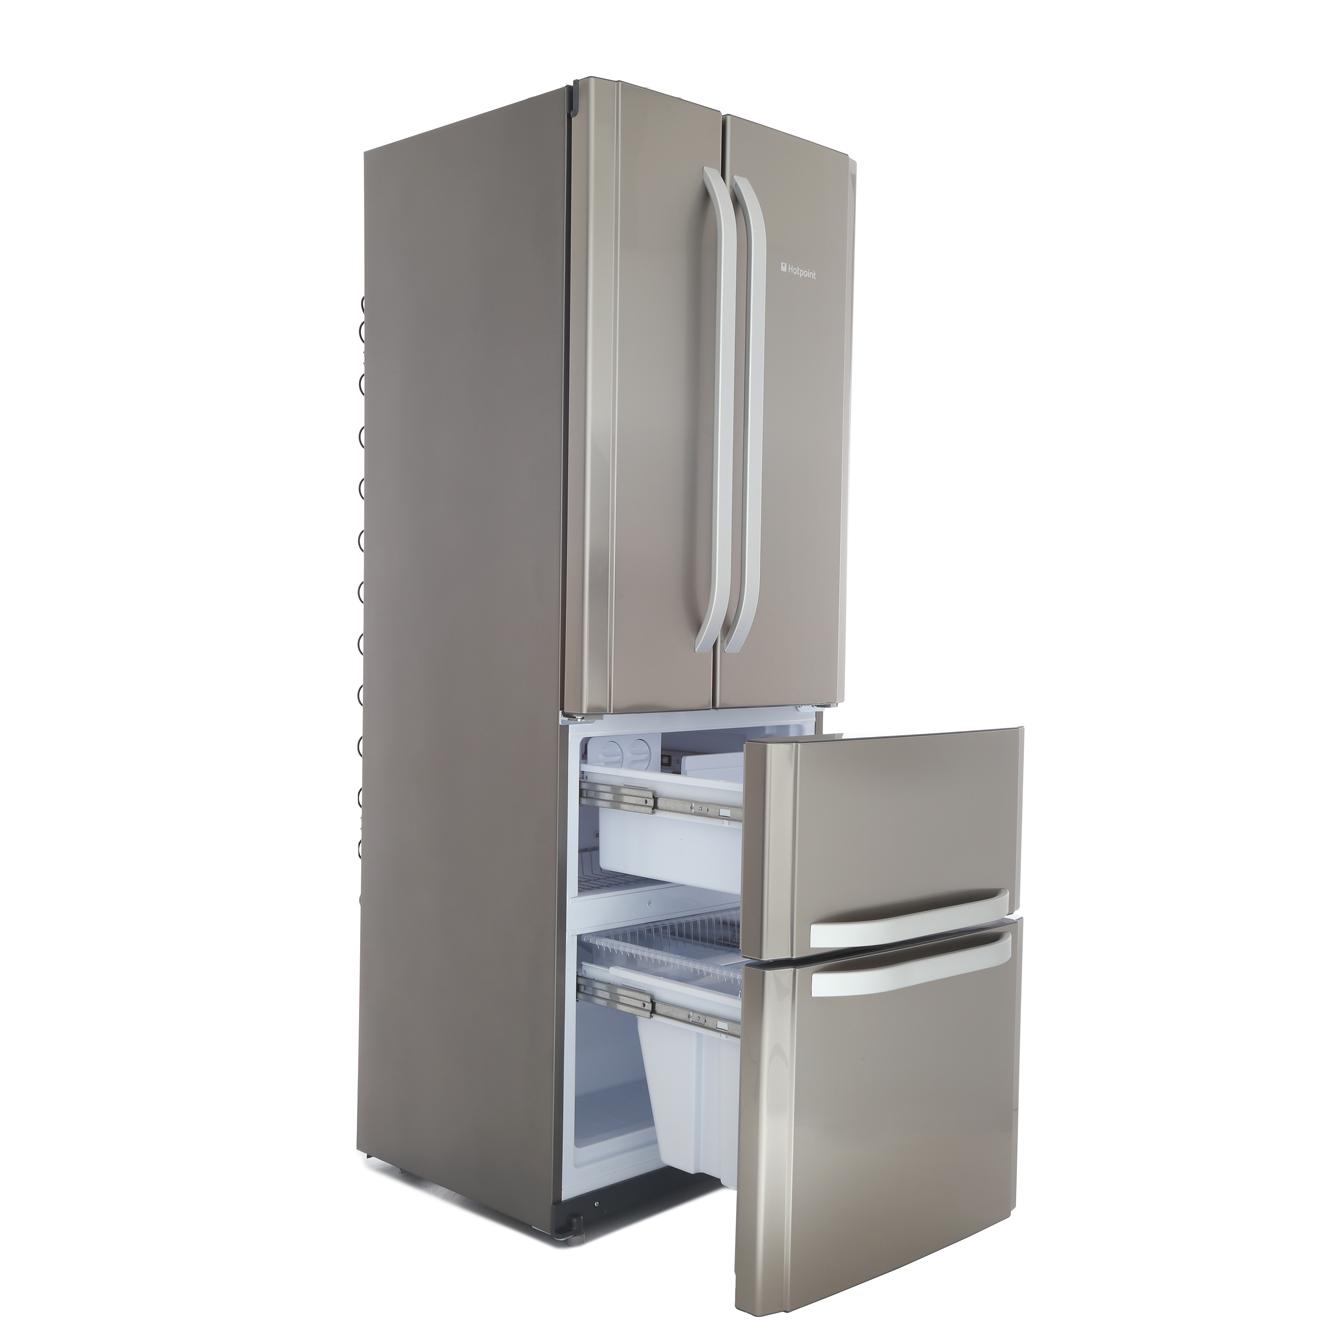 Buy Hotpoint Ffu4dx American Fridge Freezer Stainless